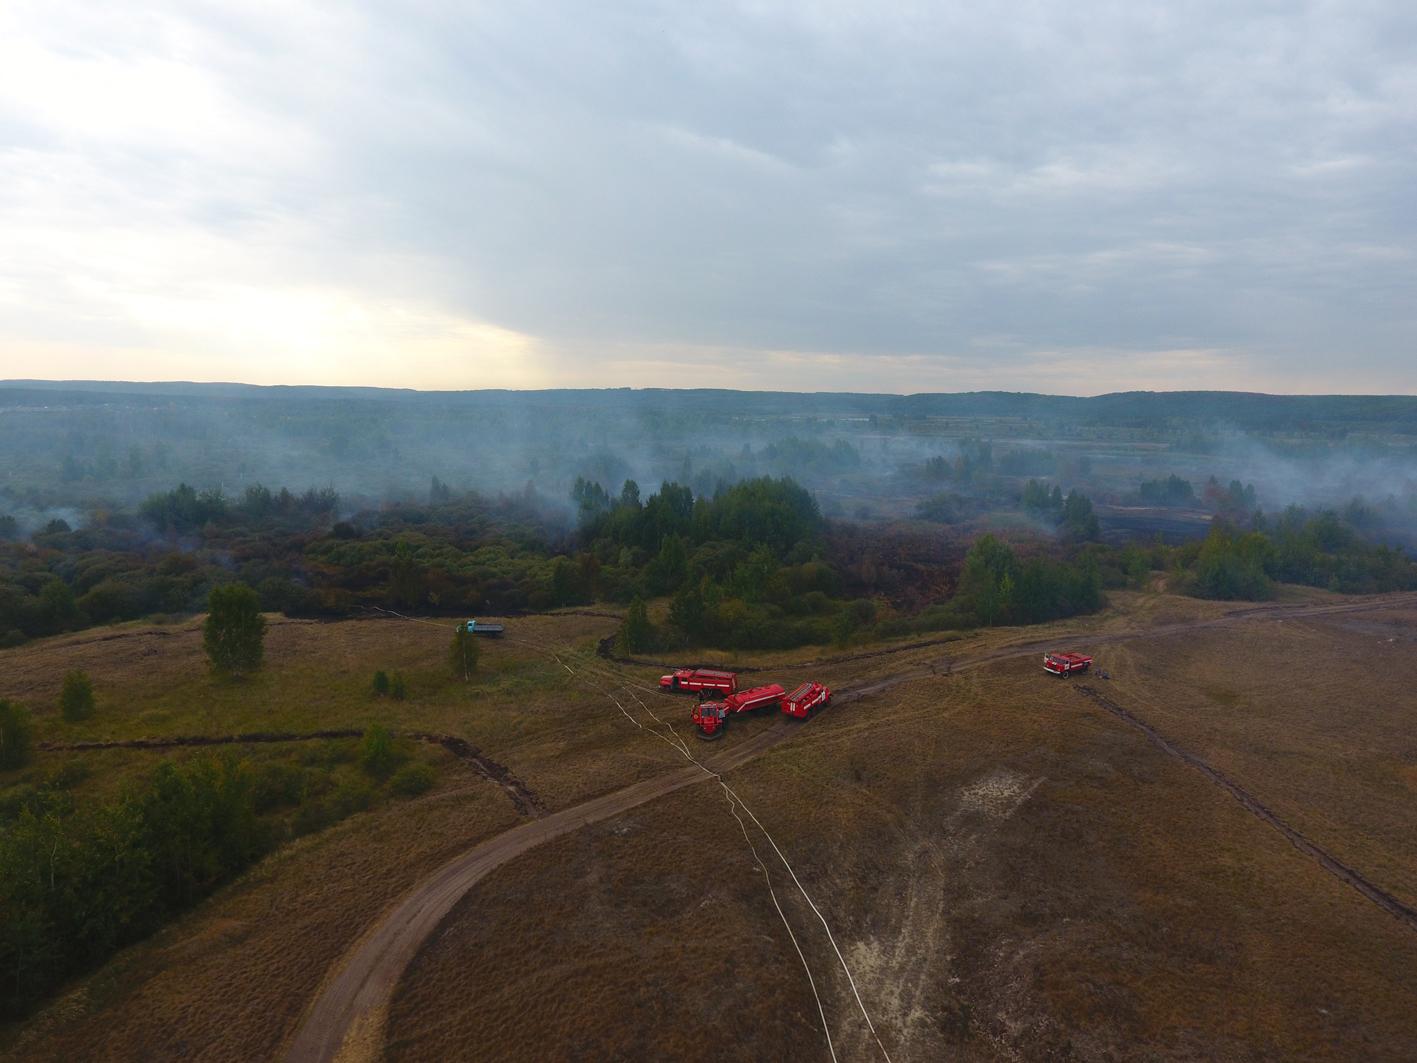 В Черкасской области объявлен режим ЧС из-за горящего торфа: фото